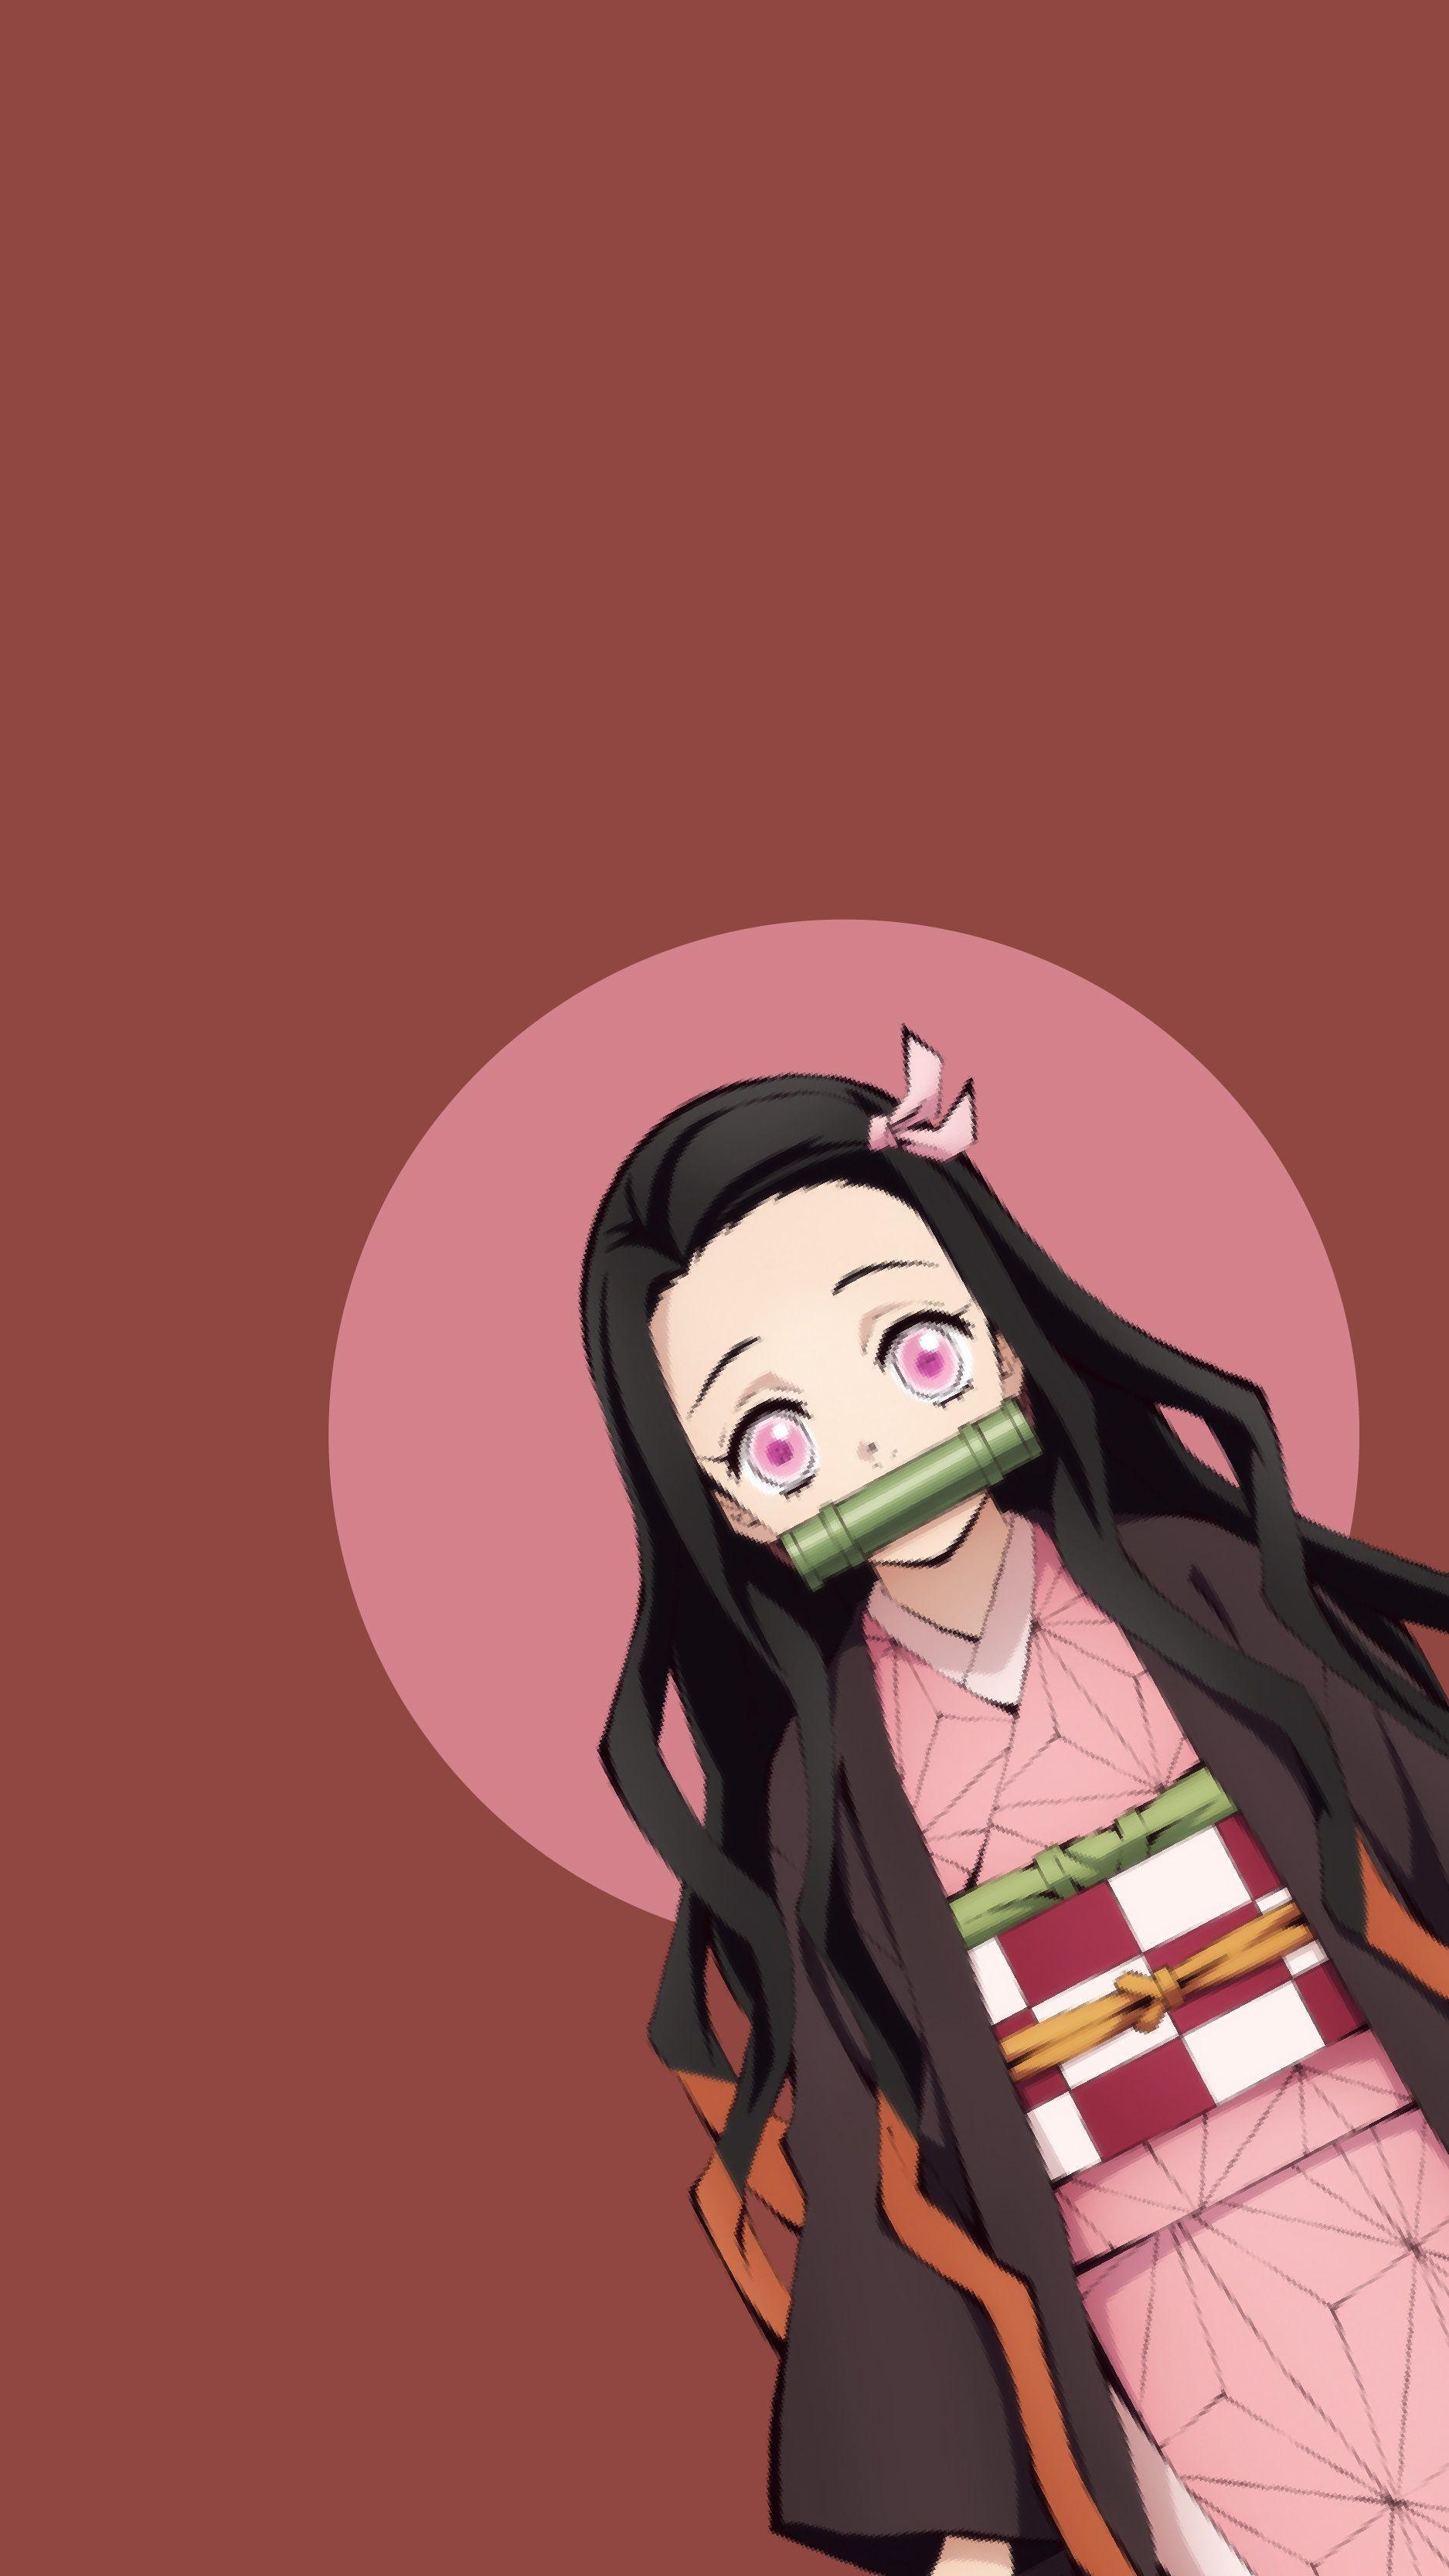 Zu Damonentoter Damonentoter Nezuko Phonewallpaperquotes Telefon Tapete Telefon Tapete Telefon Chibi Wallpaper Anime Wallpaper Iphone Cute Anime Wallpaper